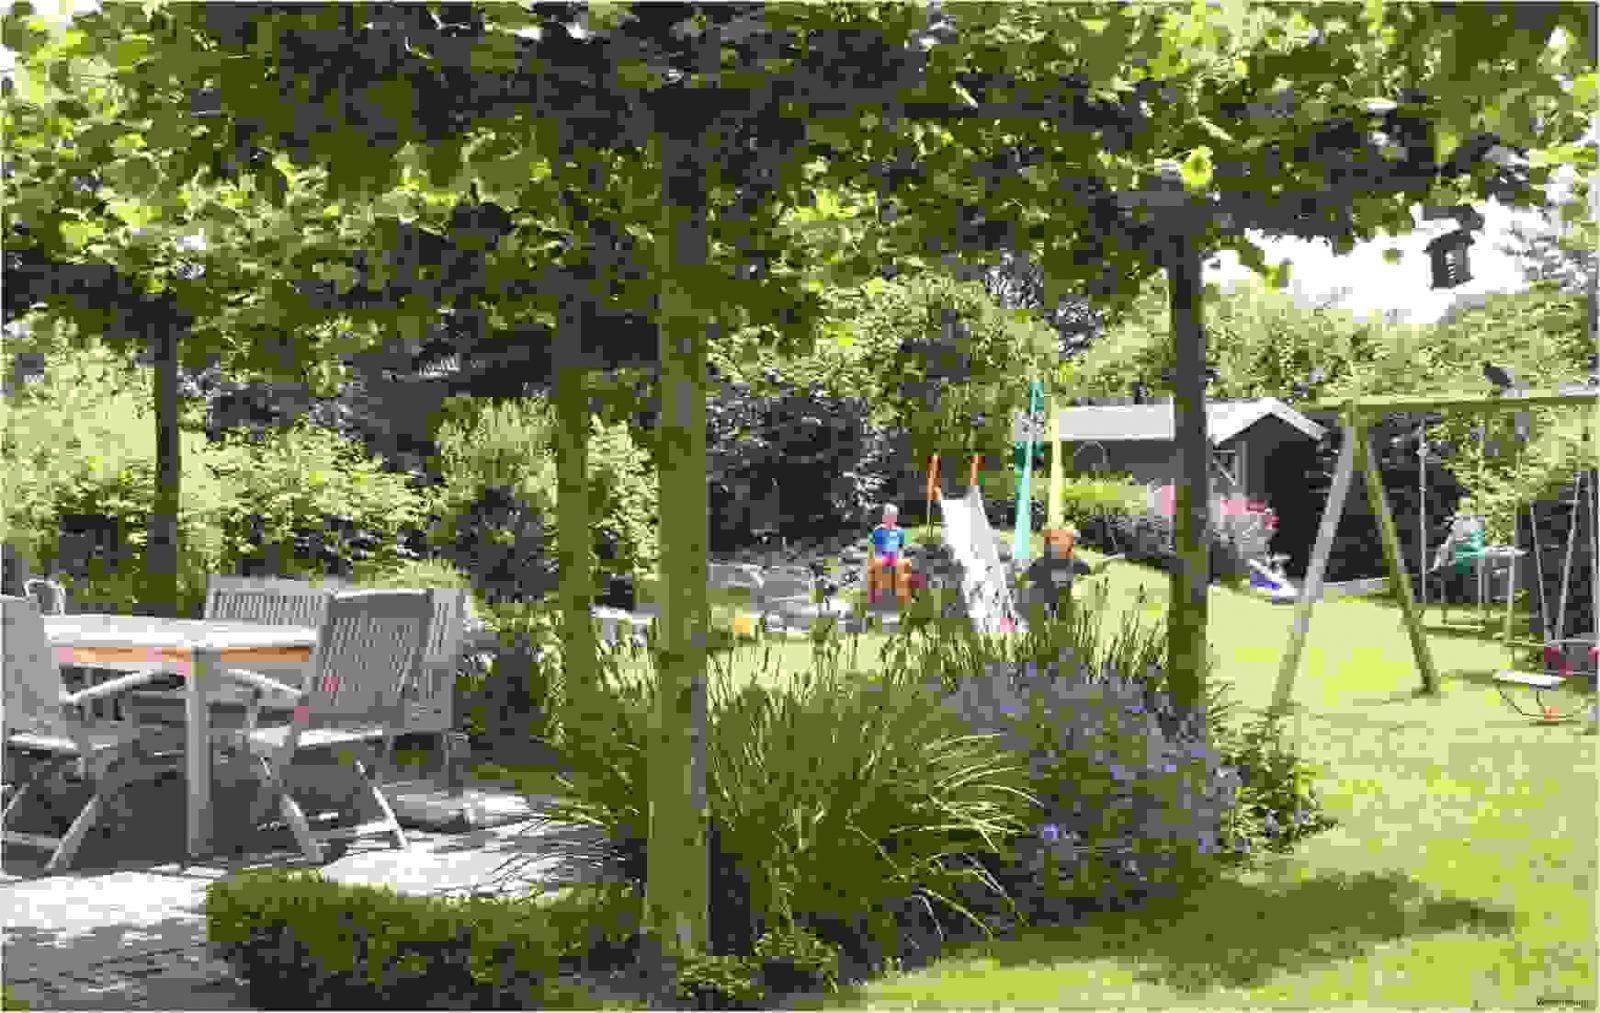 Elegantes  Wohndesign Kreative Gartengestaltung Von von Kreative Gartengestaltung Selber Machen Photo